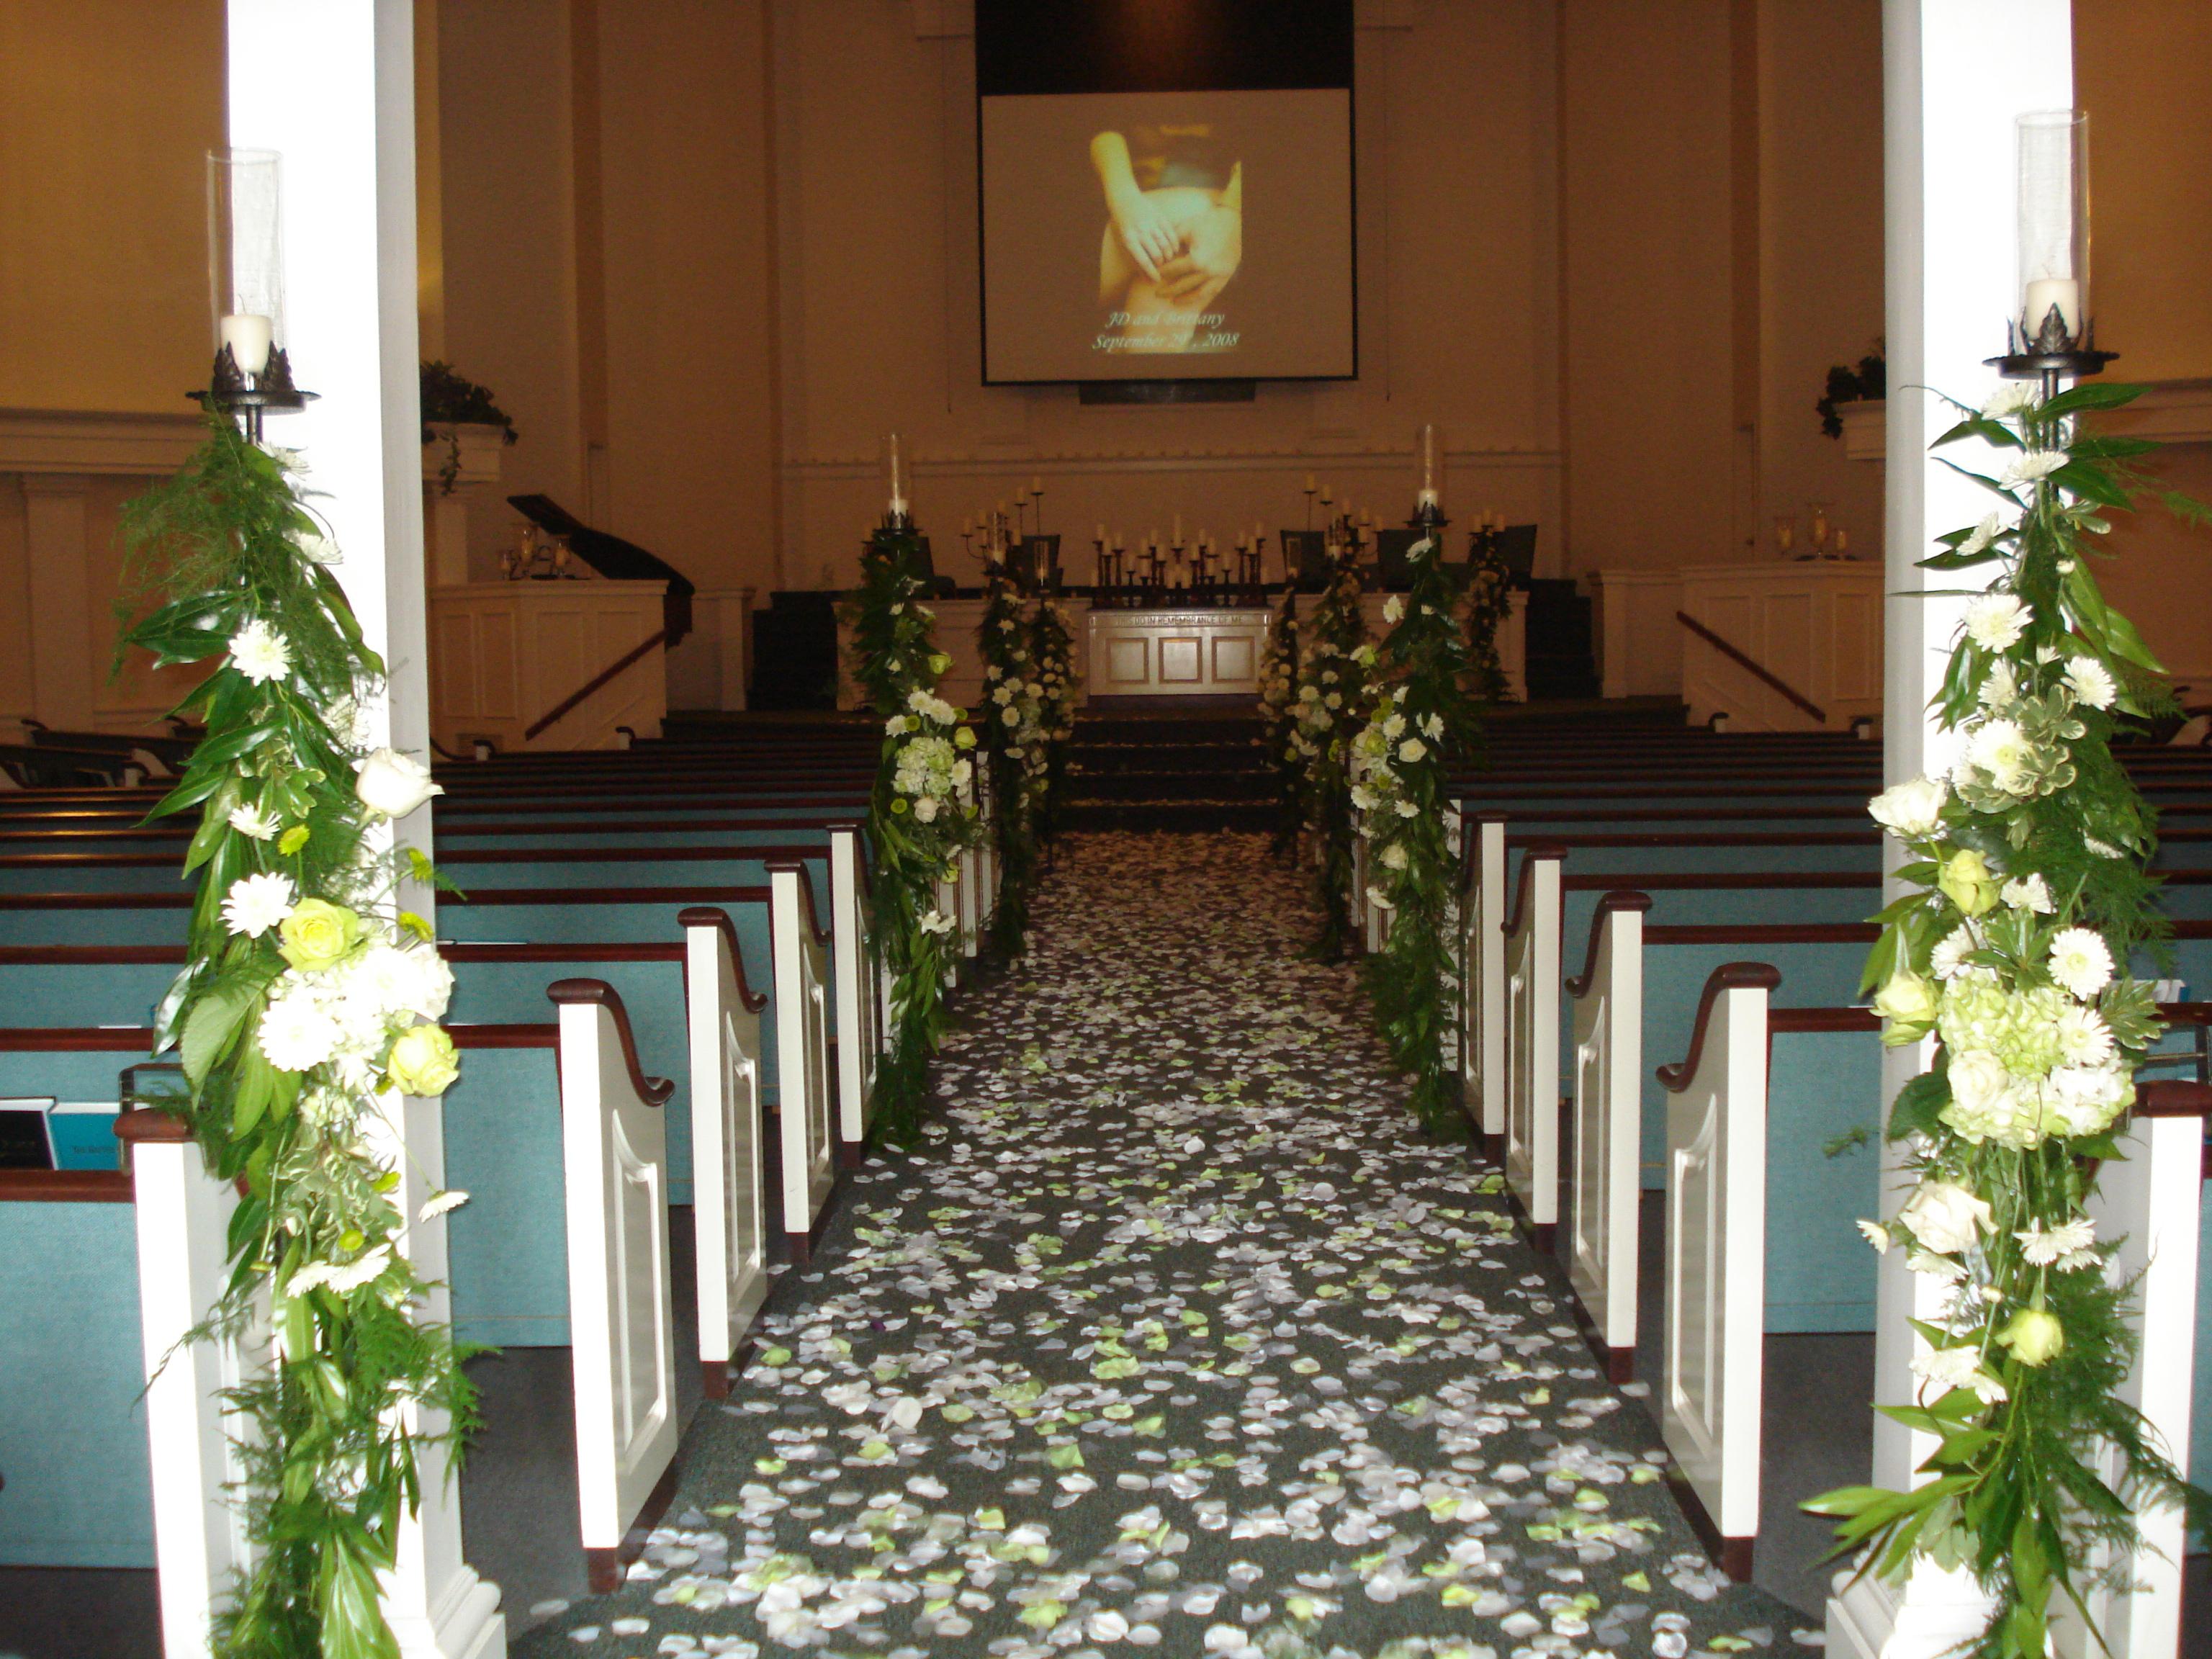 Grassland Baptist Galloway 9-29-2008008